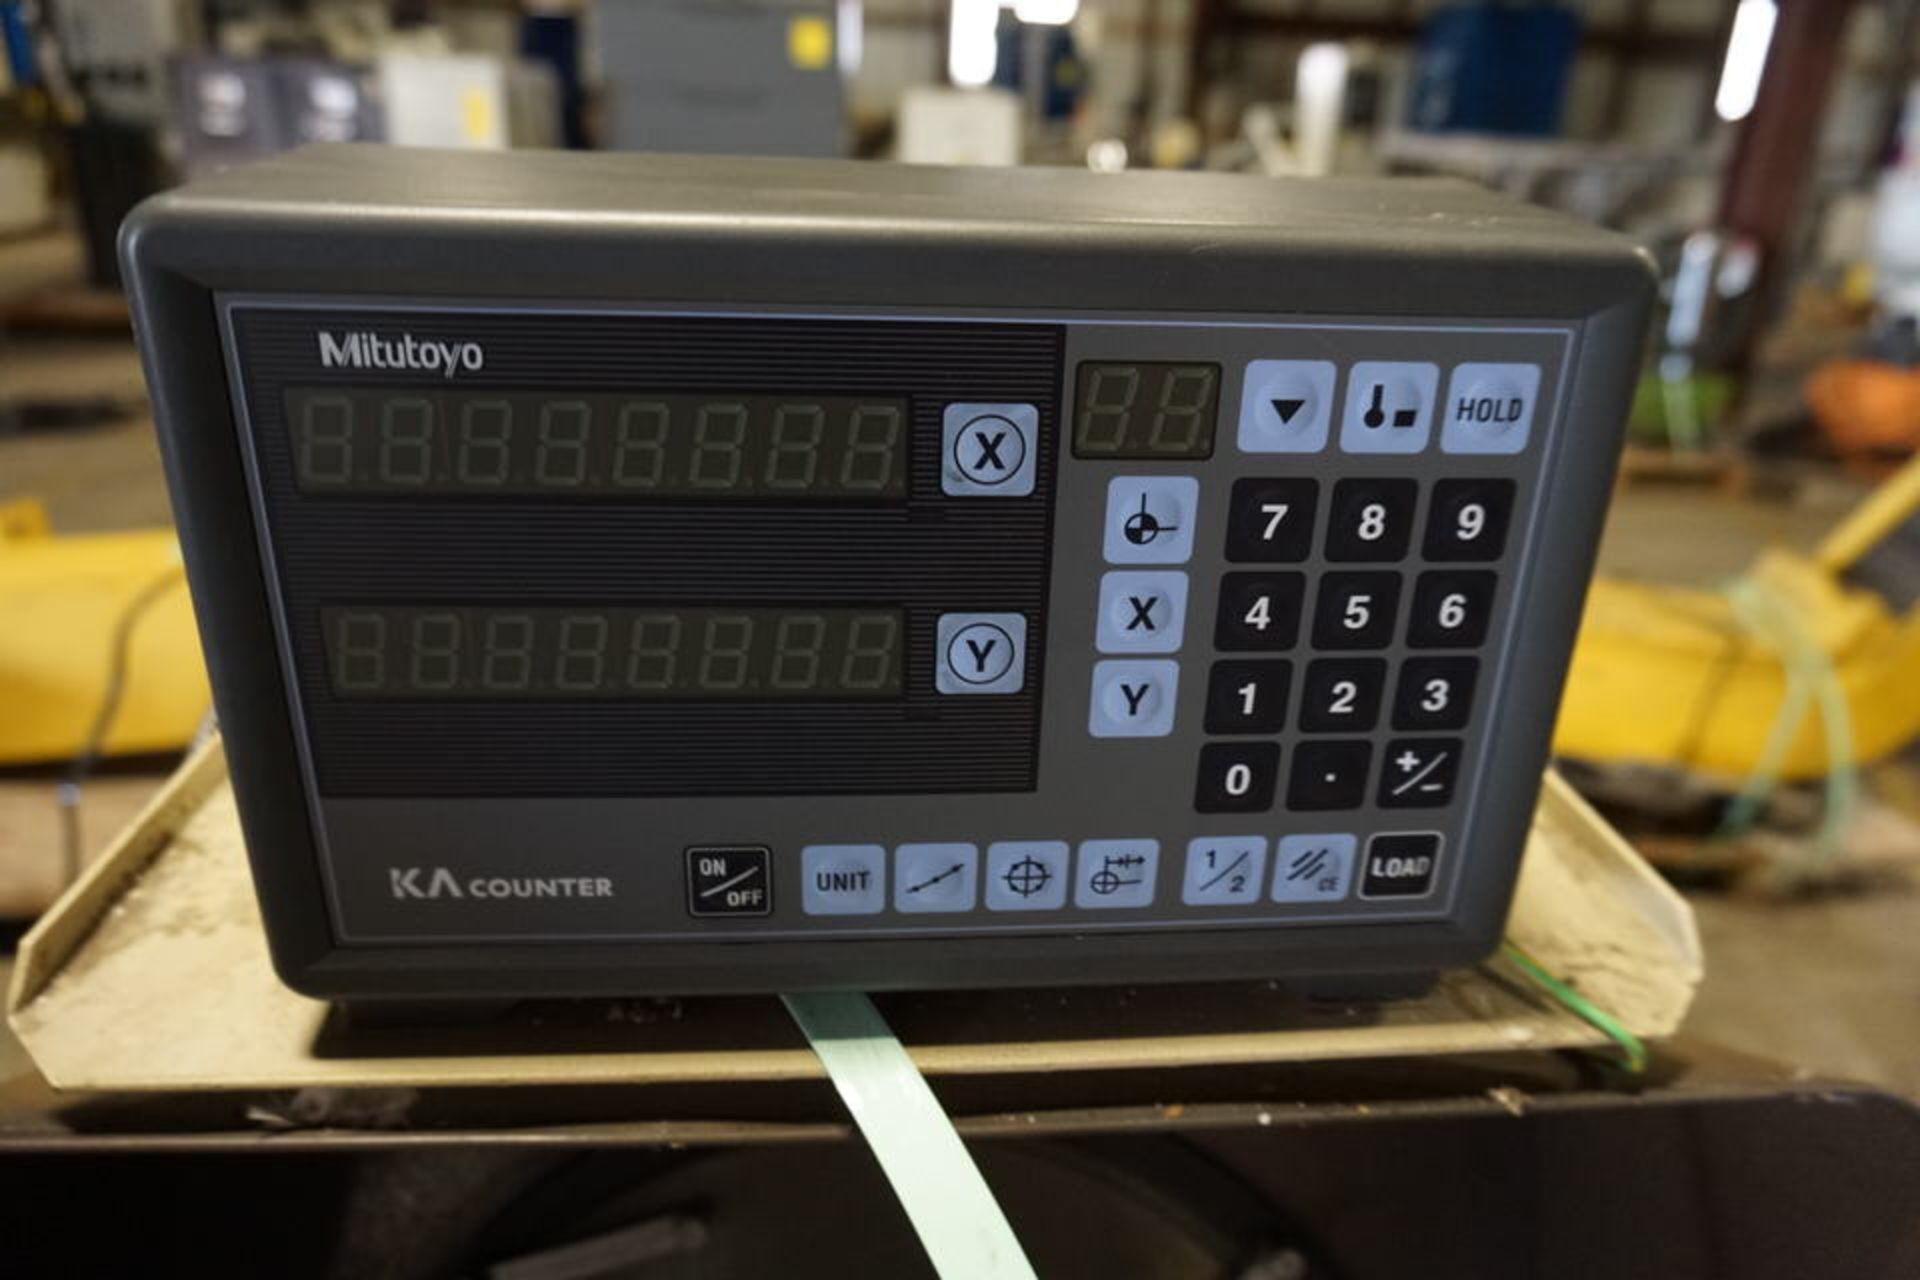 Lot 44 - CONDUCTRIX ELEC CORD REEL W/ BUDGIT 1/2 TON HOIST, MITUTOYO OPTICAL COMPARATOR MDL:PH350 W/ DRO &